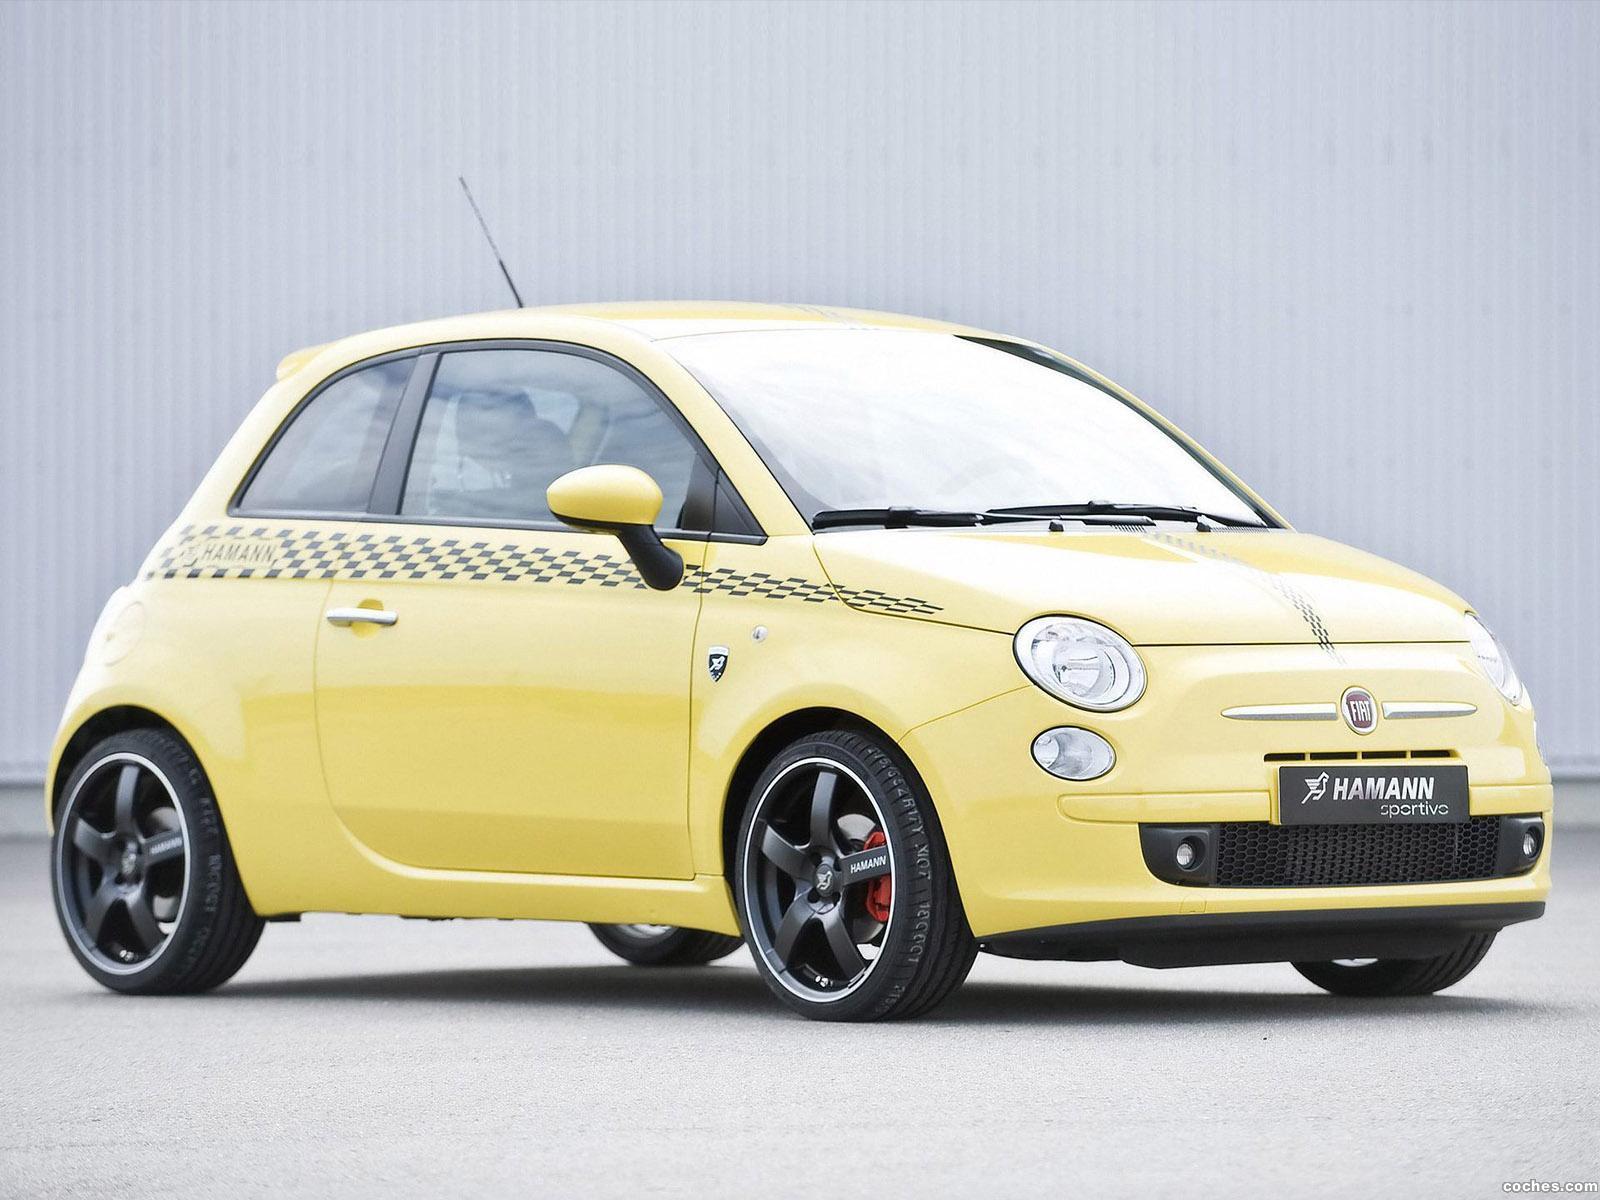 Foto 11 de Fiat Hamann 500 Sportivo 2008